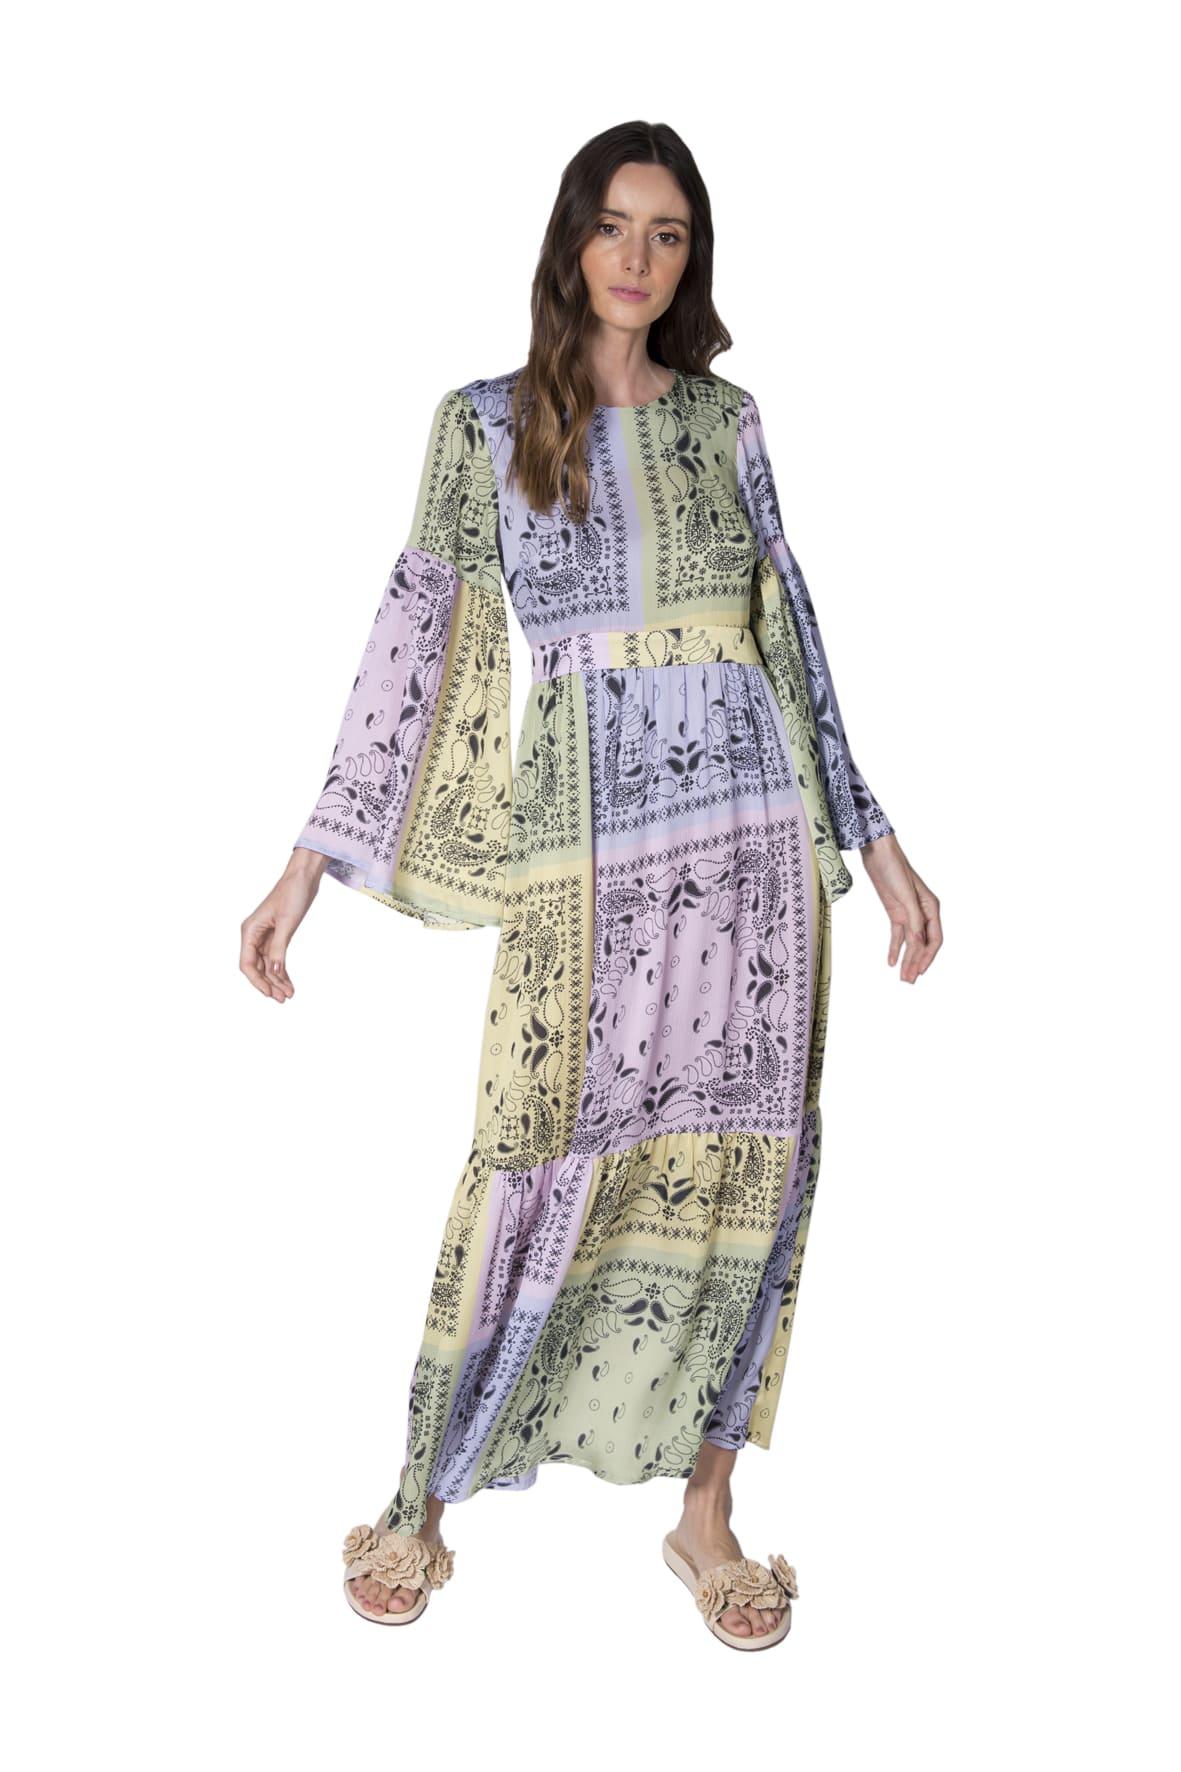 Tee Match - vestido bandana colors manga farta